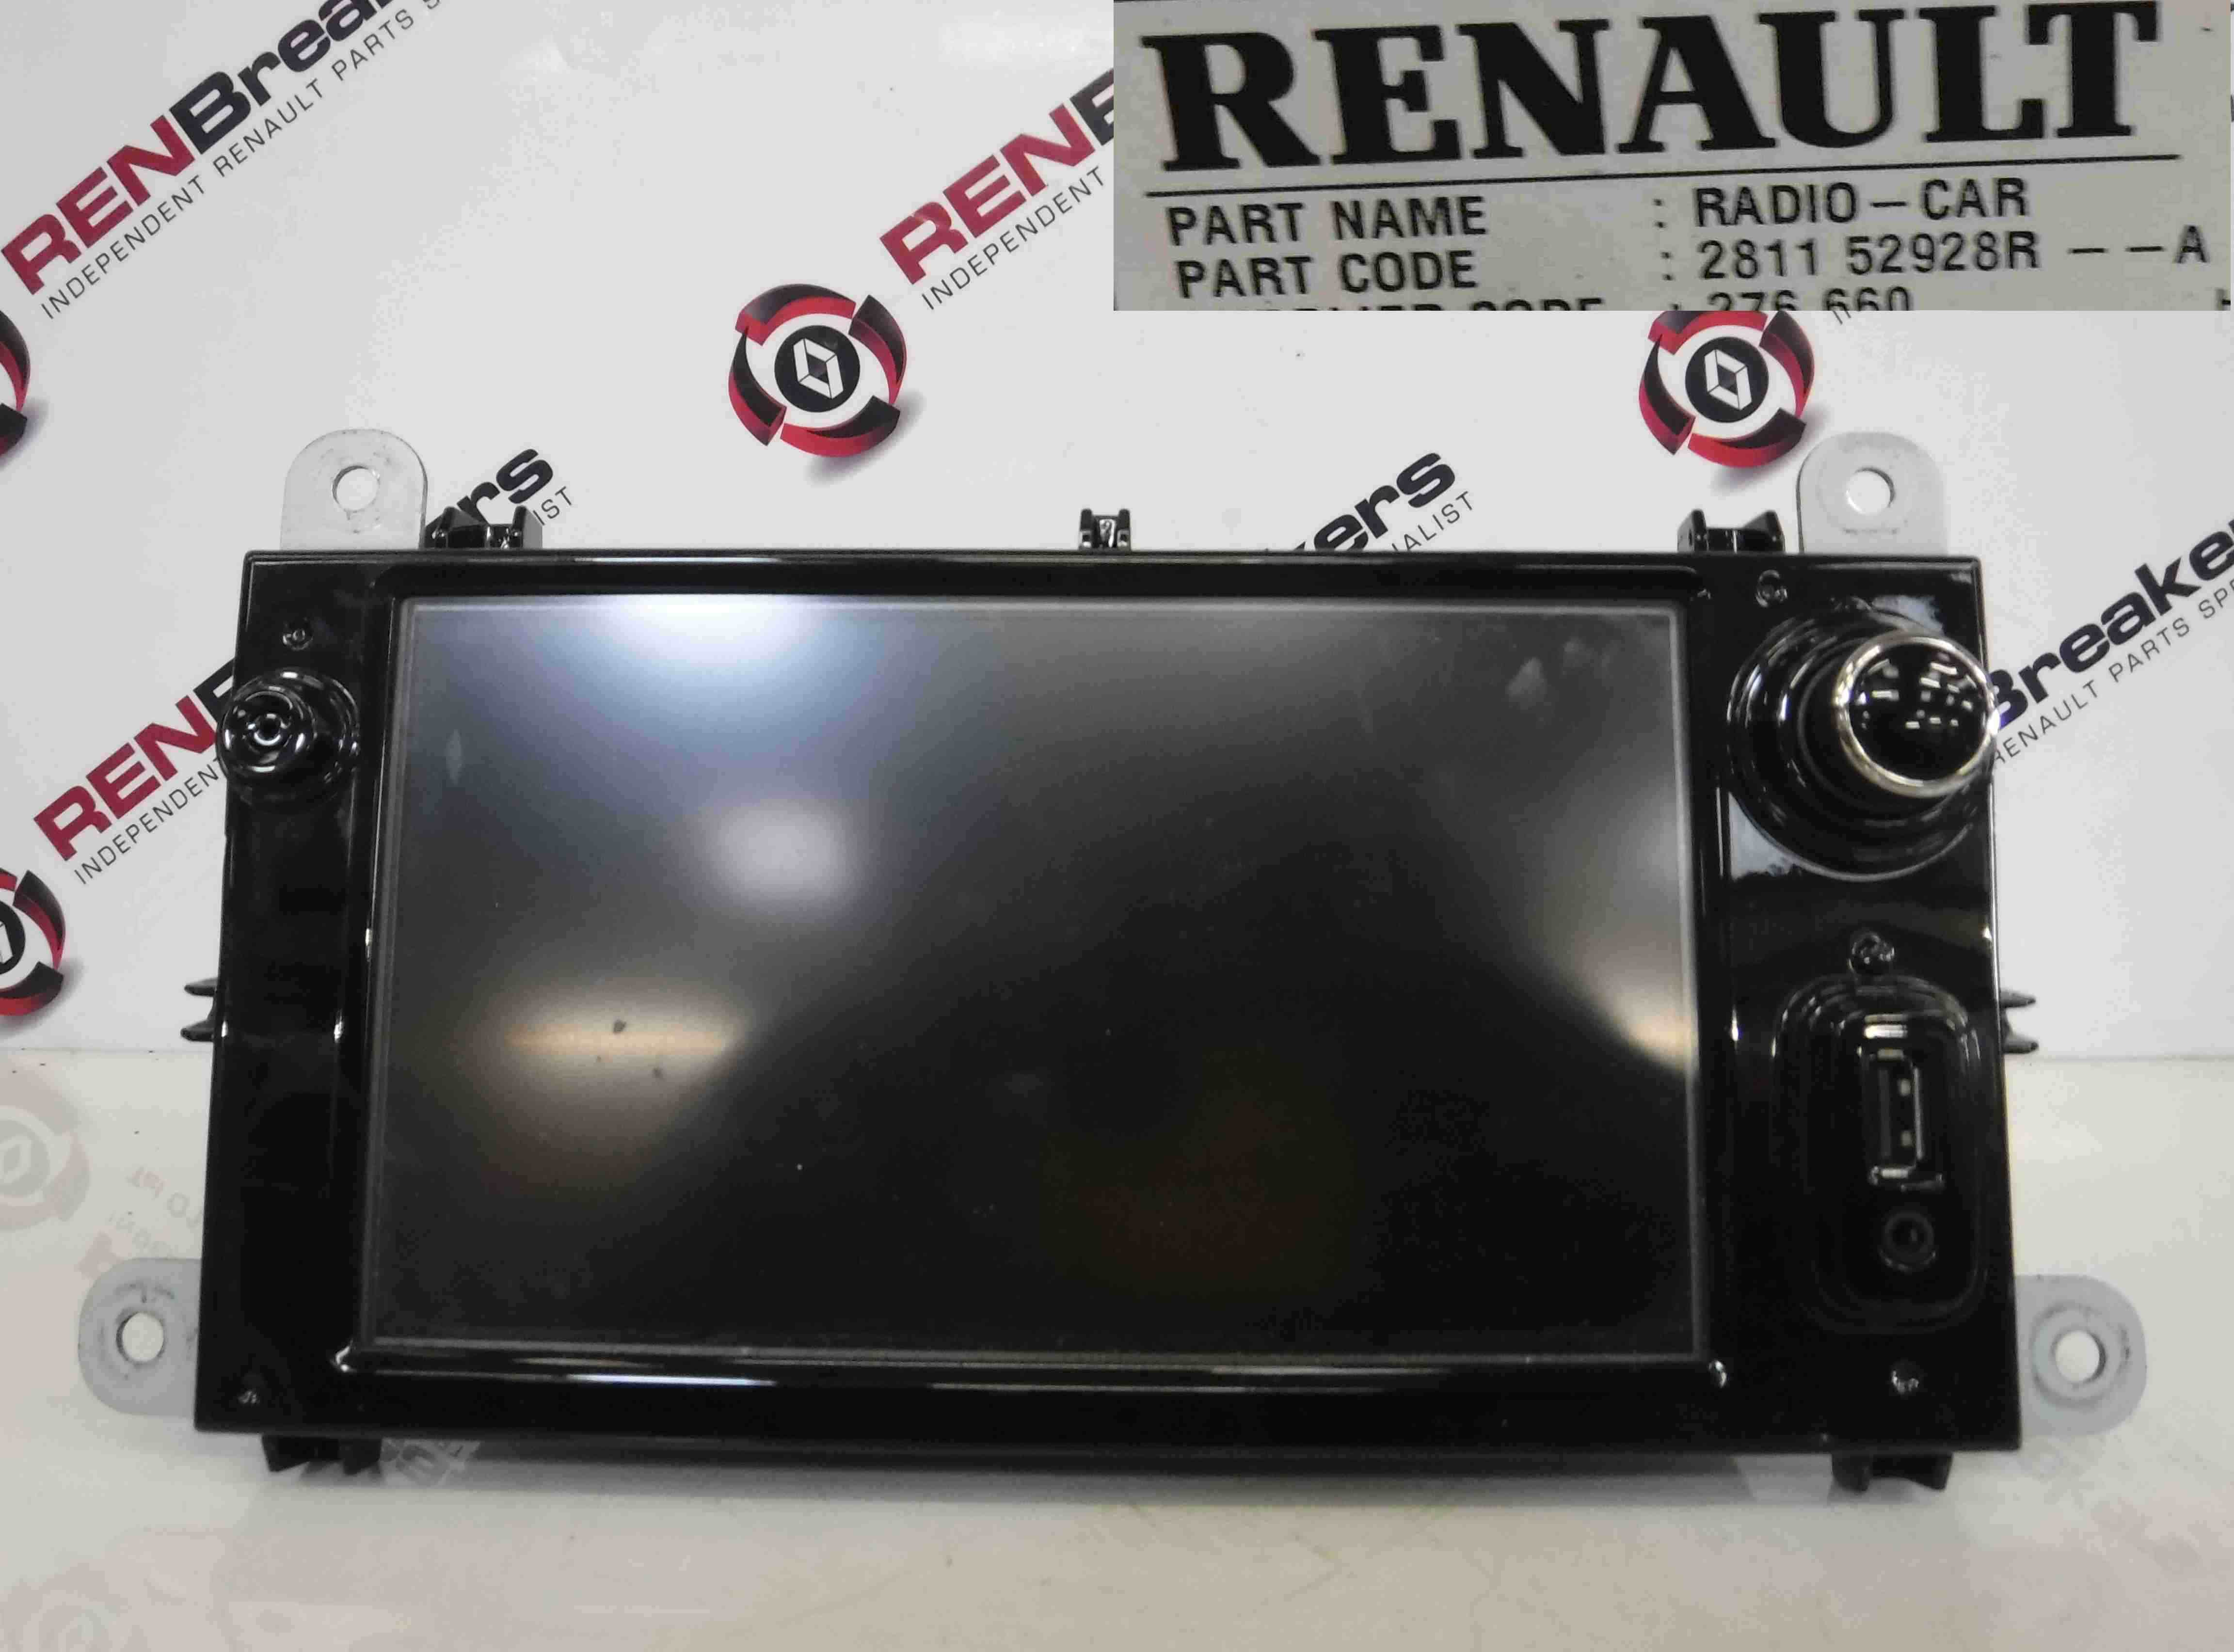 Renault Clio MK4 2013-2018 Sat Nav Radio Stereo AUX USB Screen Navigation